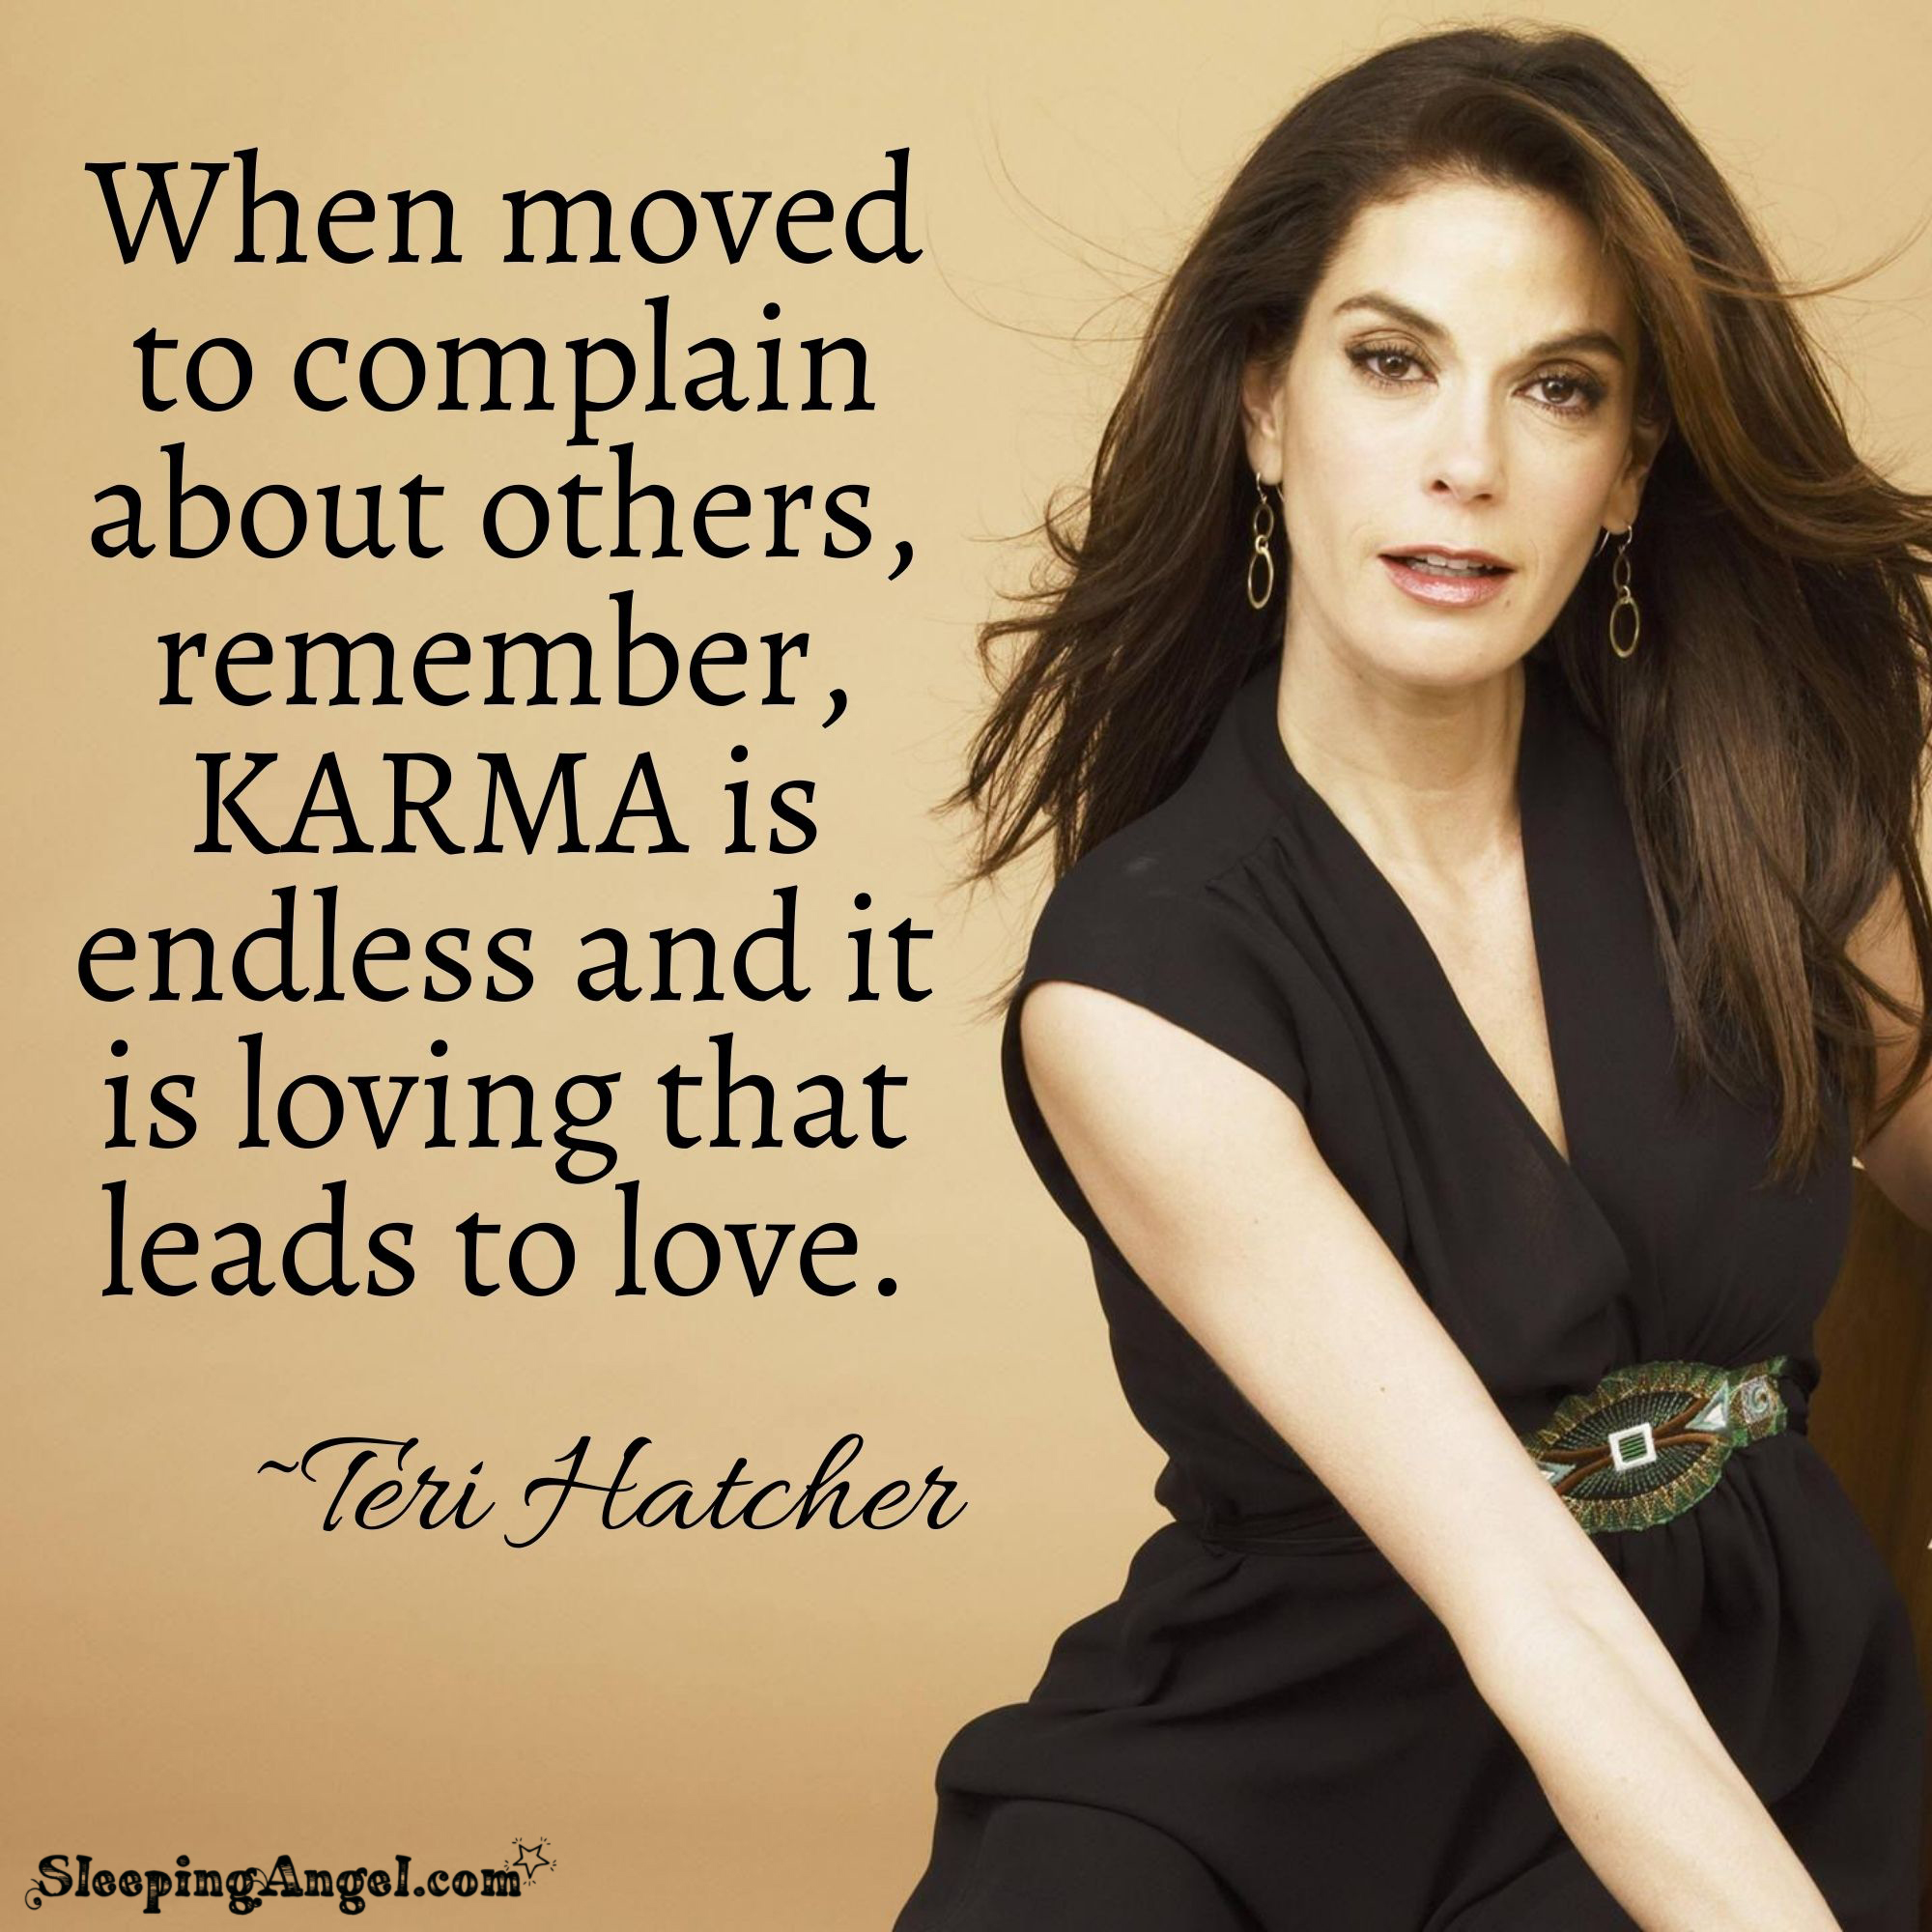 Teri Hatcher Quote